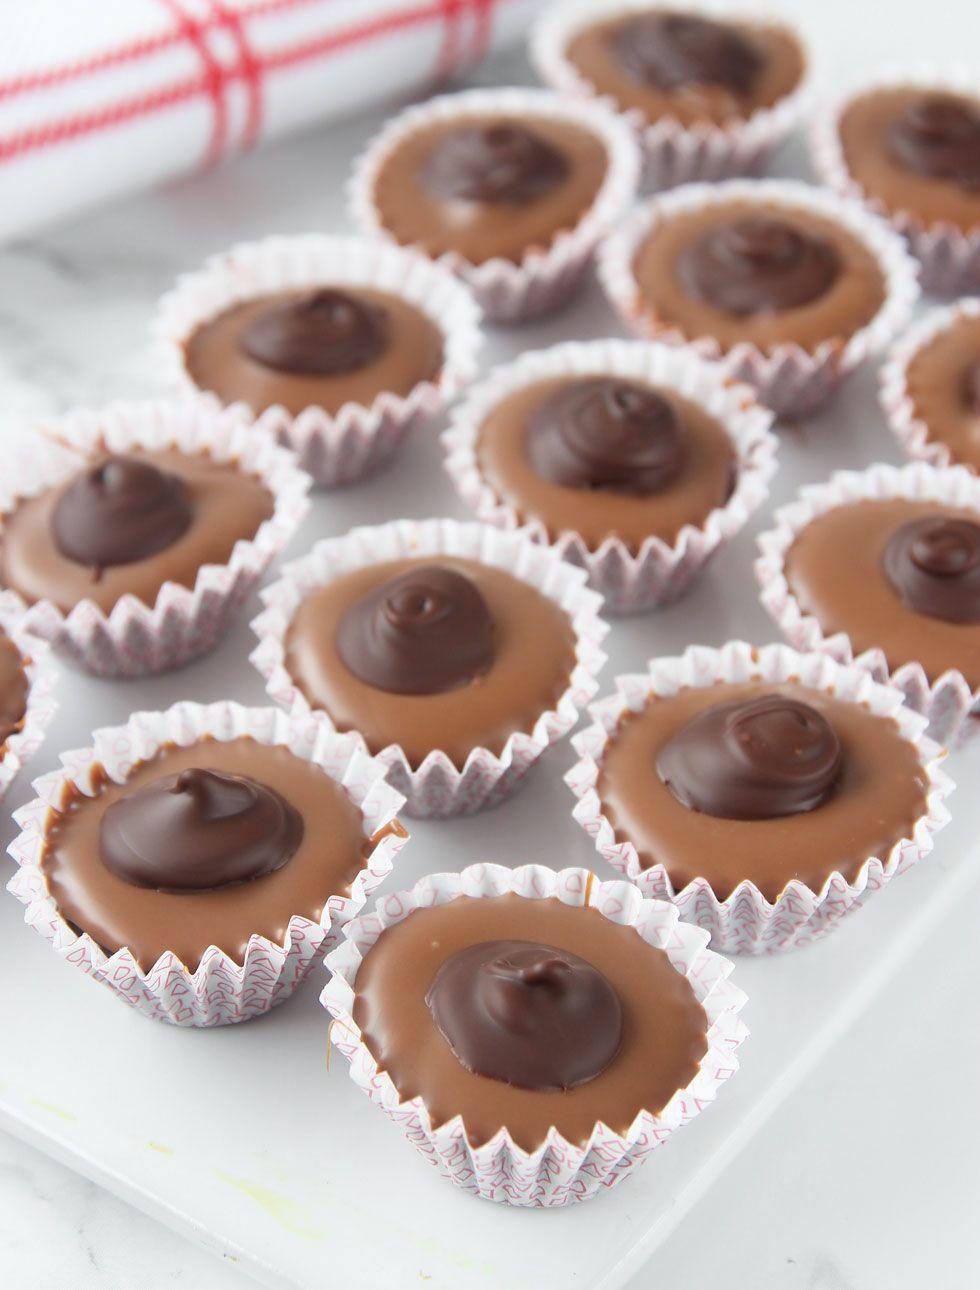 julgodis hasselnötter choklad